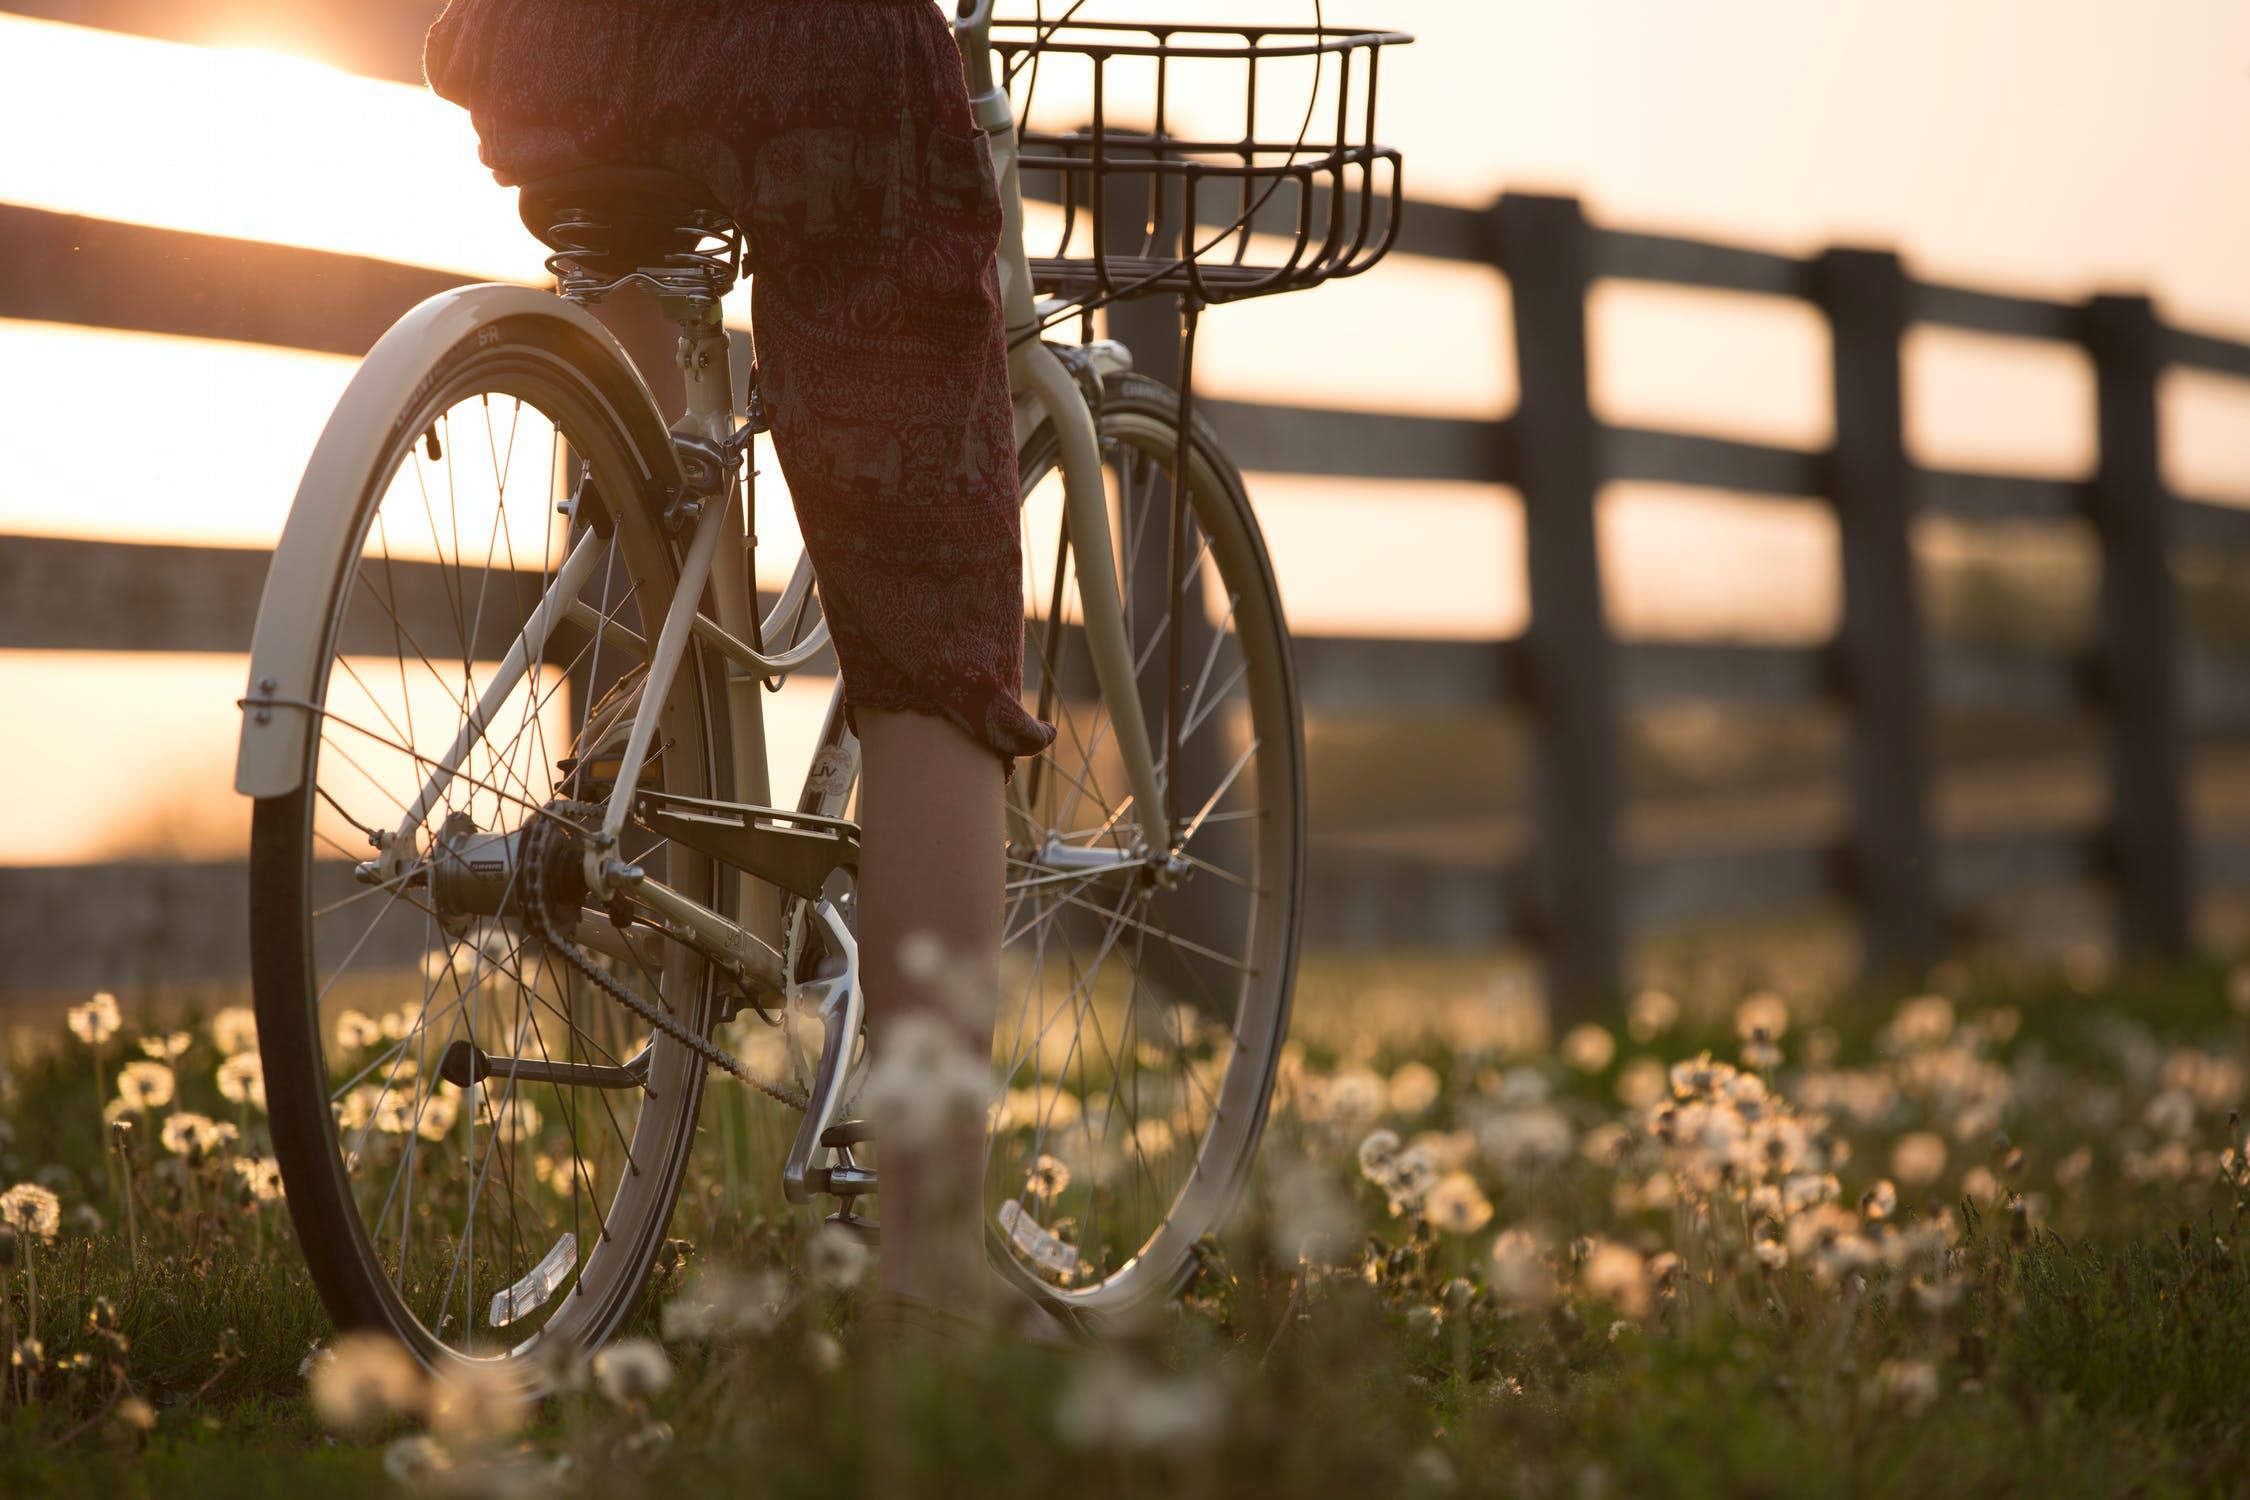 fietsendrager getest: beste fietsendragers van 2021